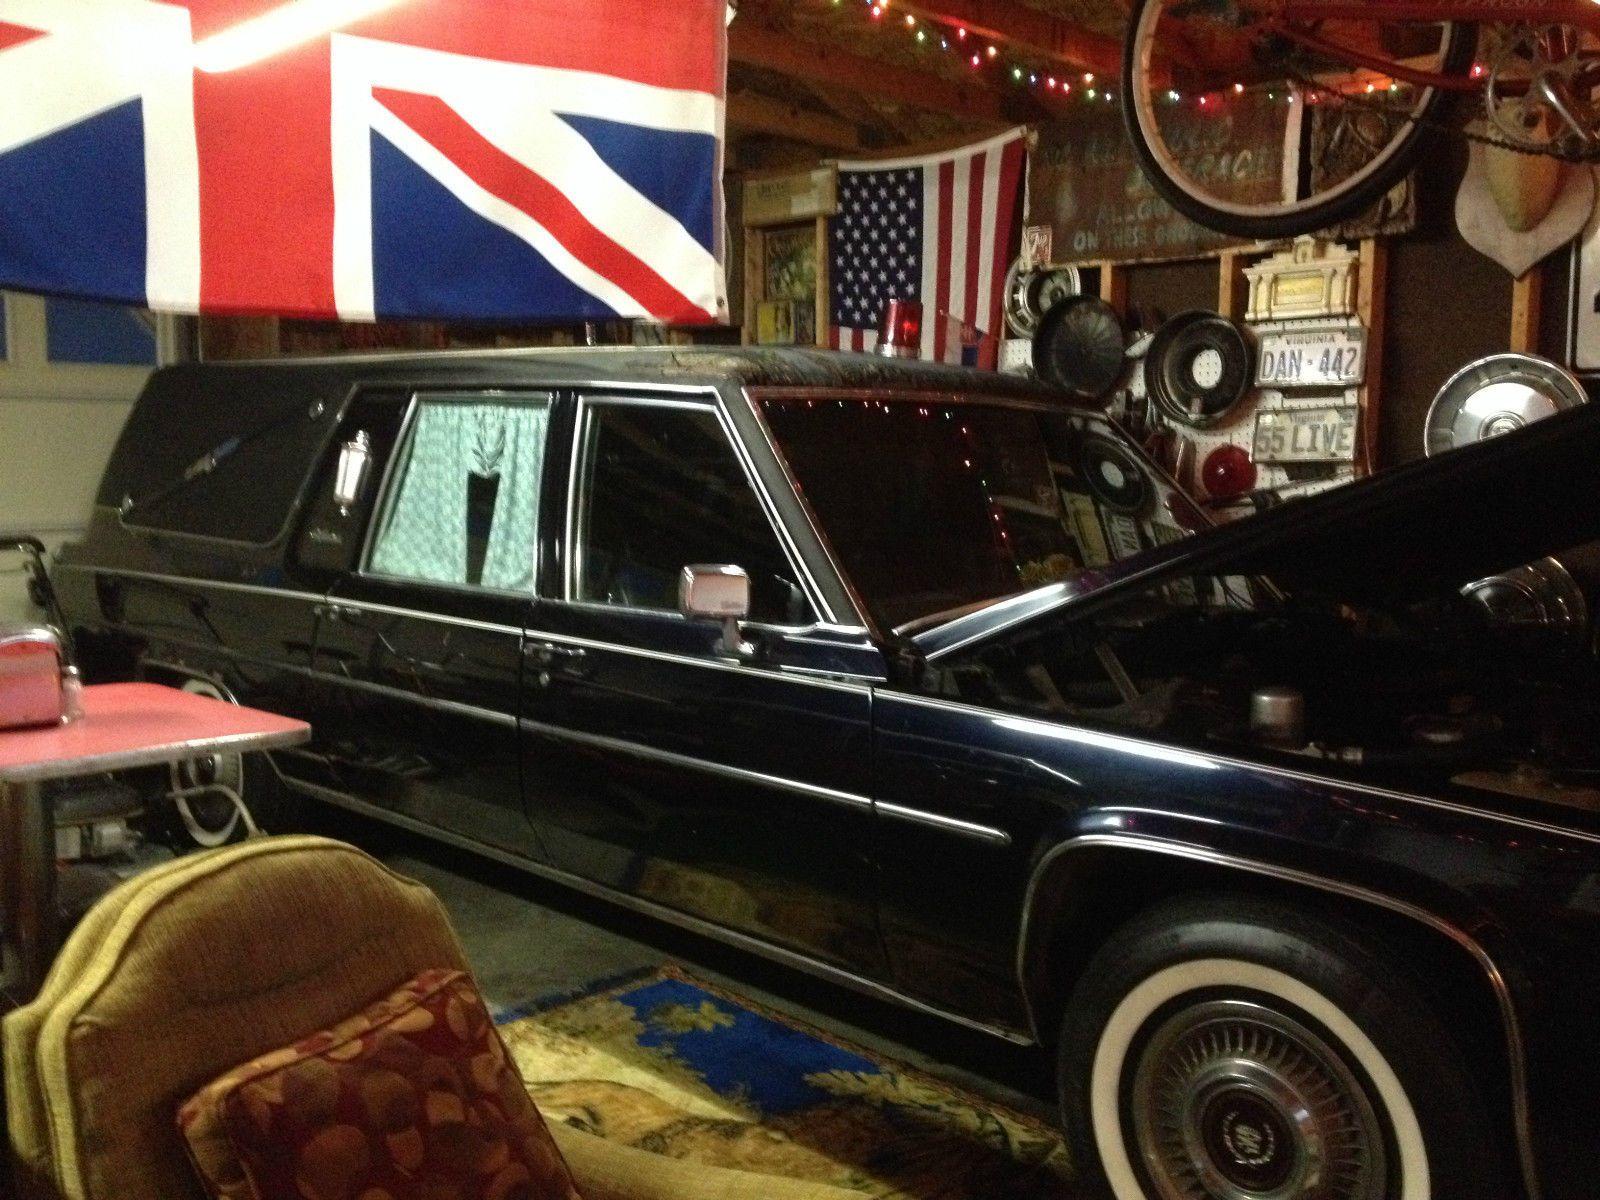 1980 cadillac s s victoria hearse rear loader for sale